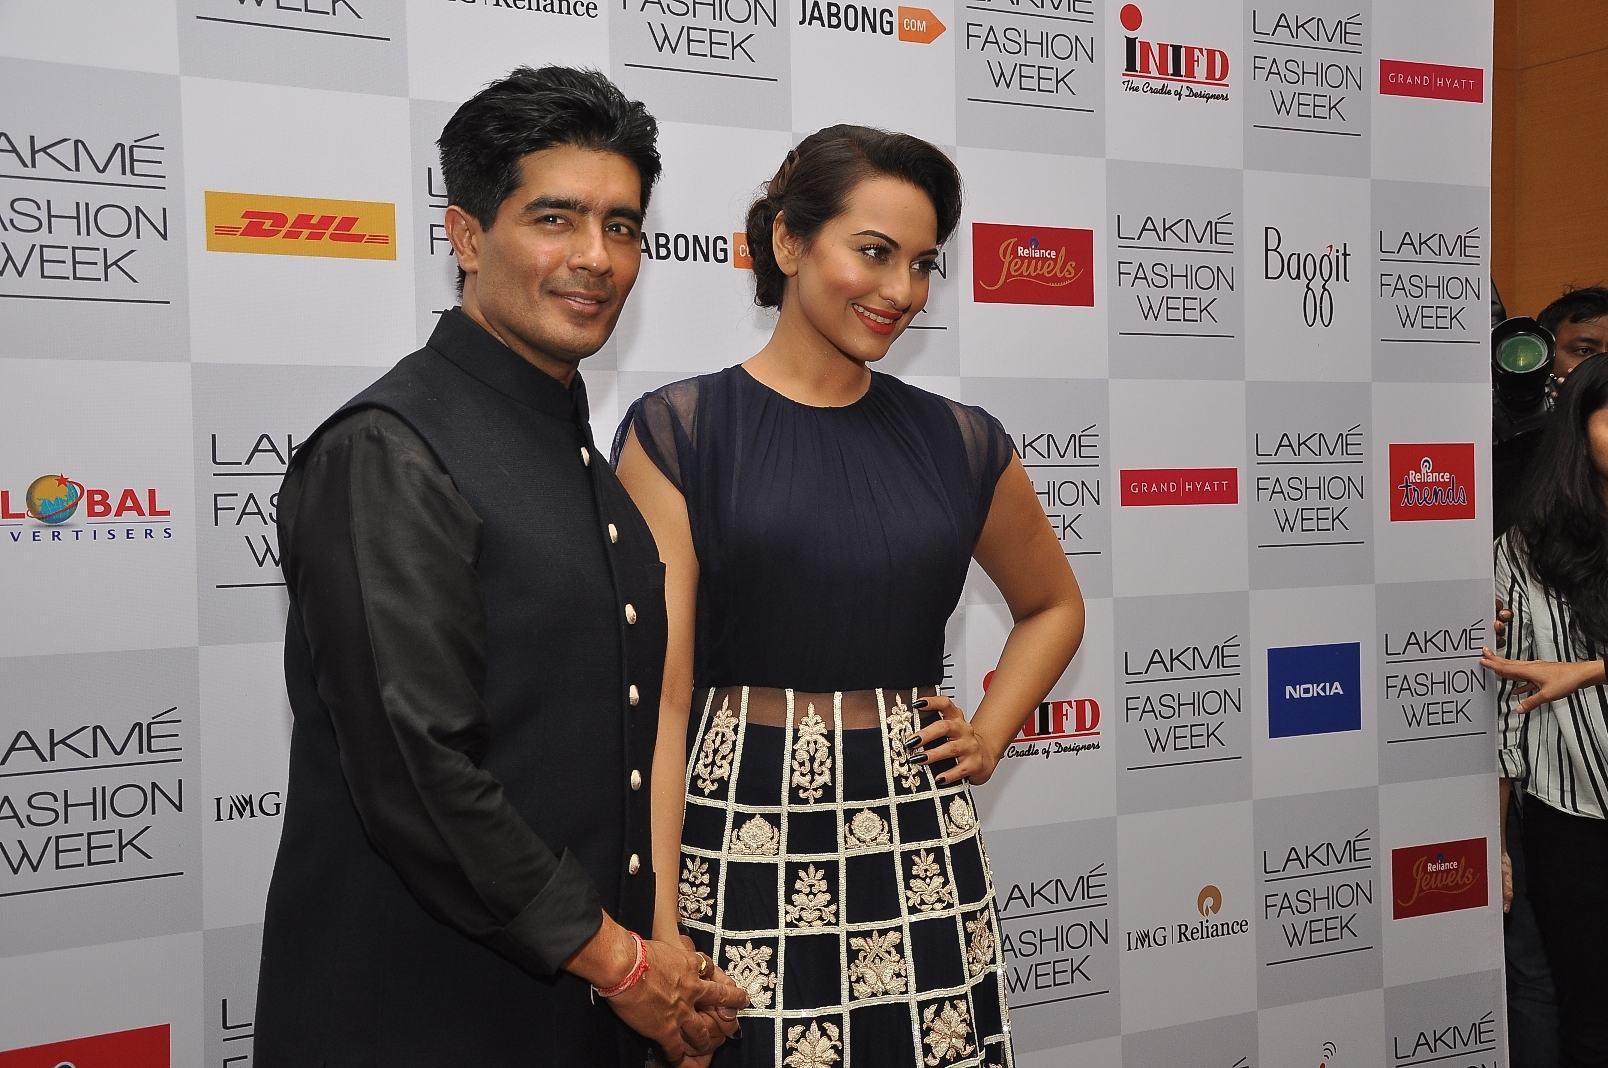 Manish Malhotra and Sonakshi Sinha